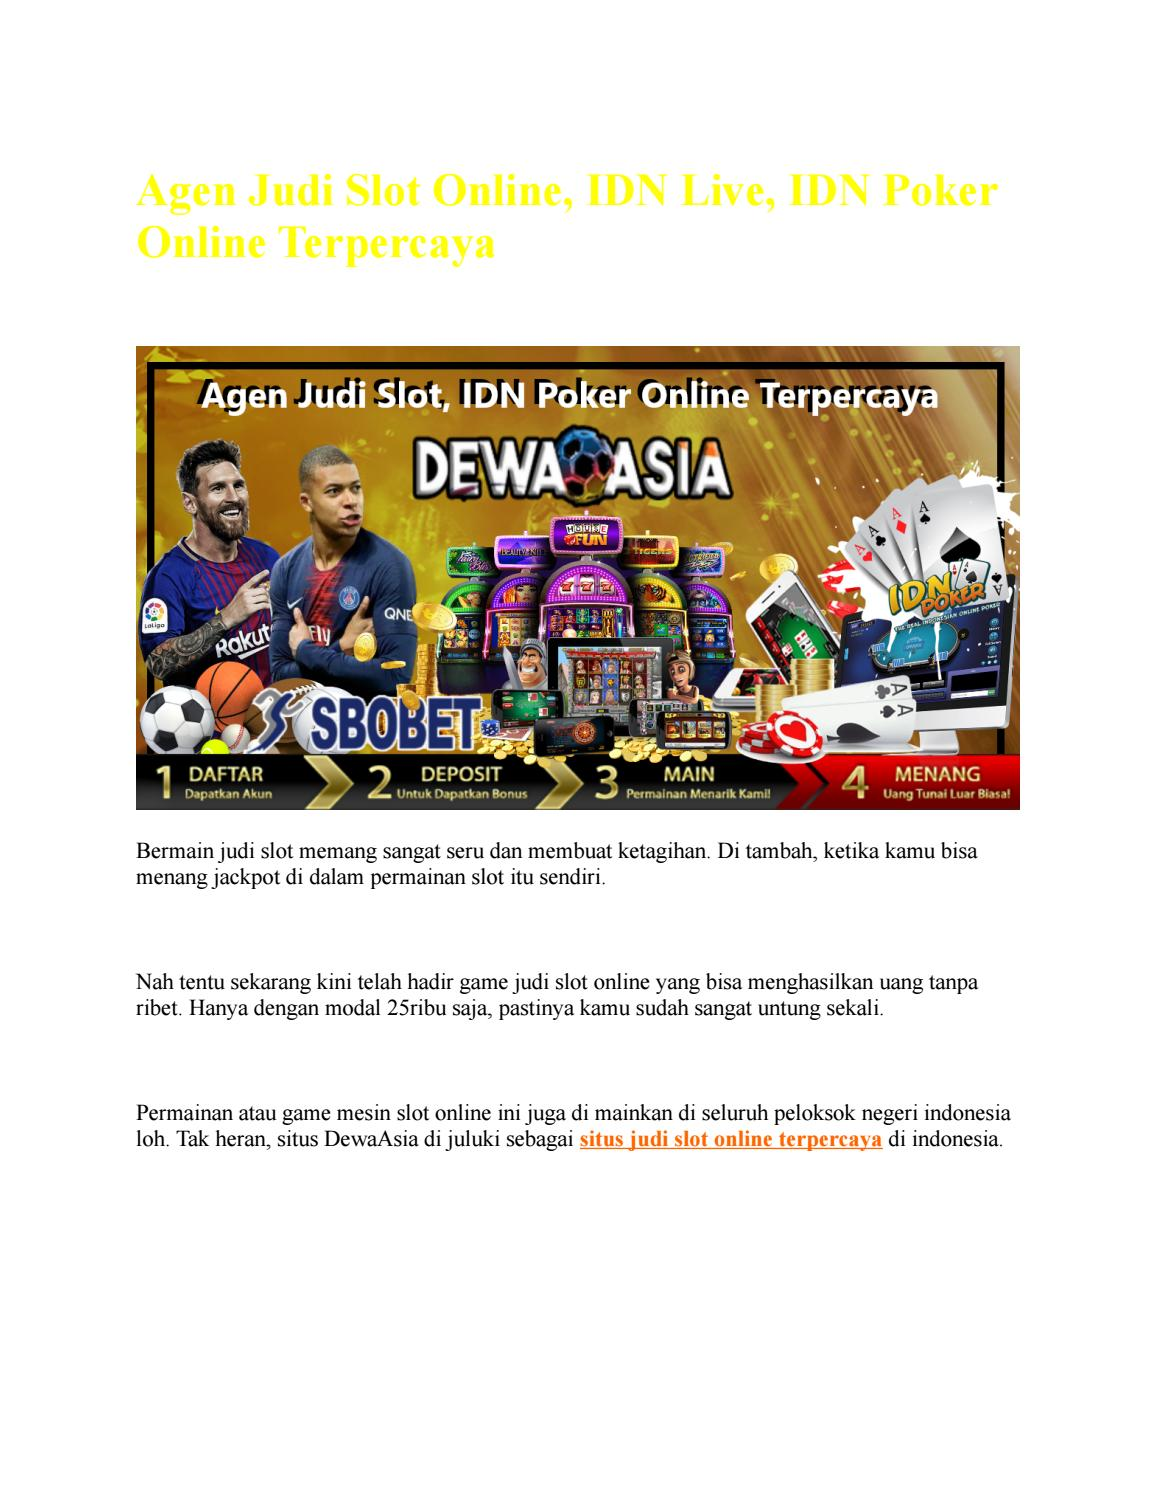 Agen Judi Idn Slot Idn Live Idn Poker Online Terpercaya Dewaasia By Chintya Verania Issuu